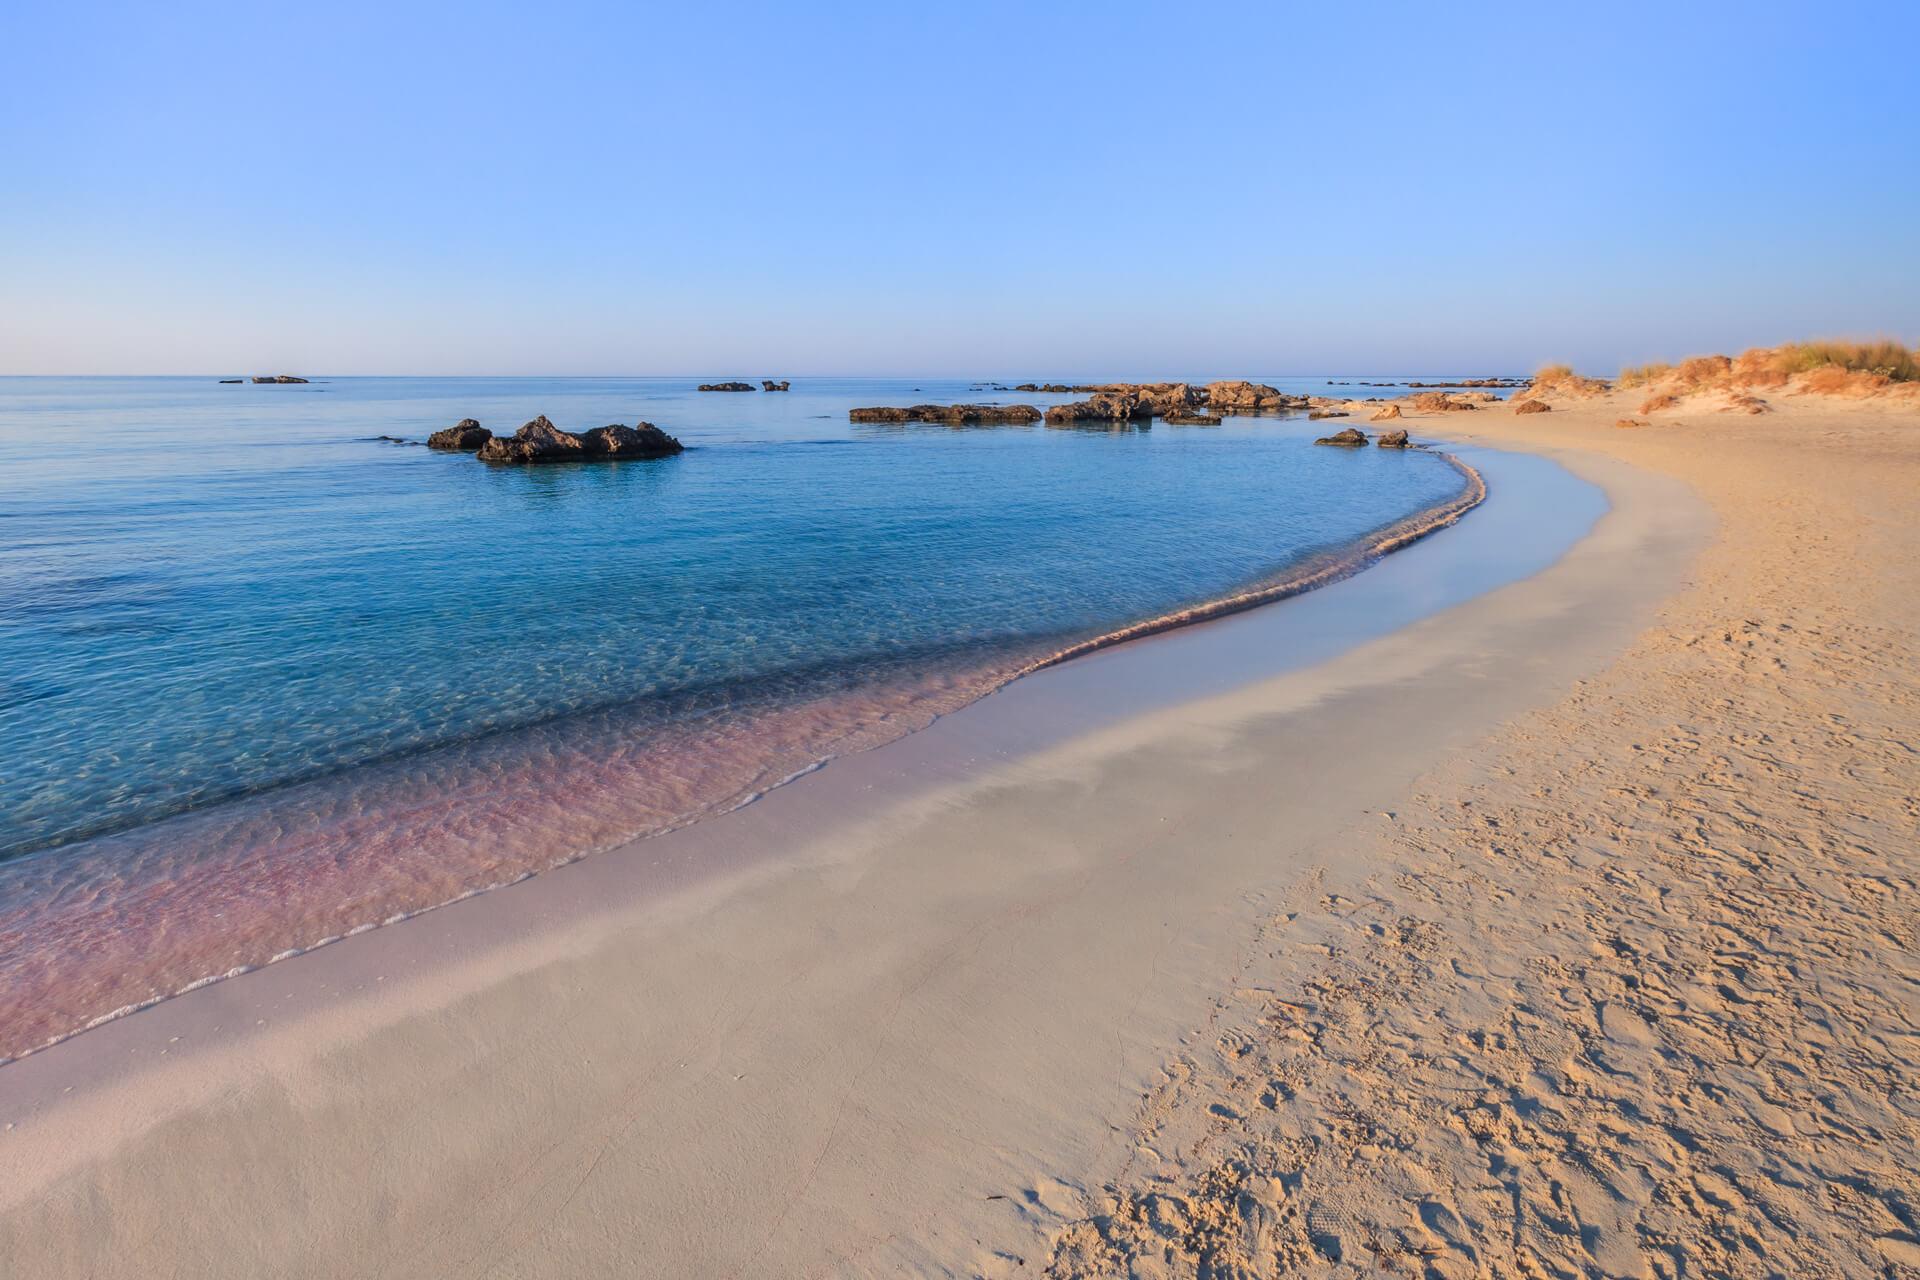 Elite Crete - Luxury Tourism in Chania, Crete - Elafonisi